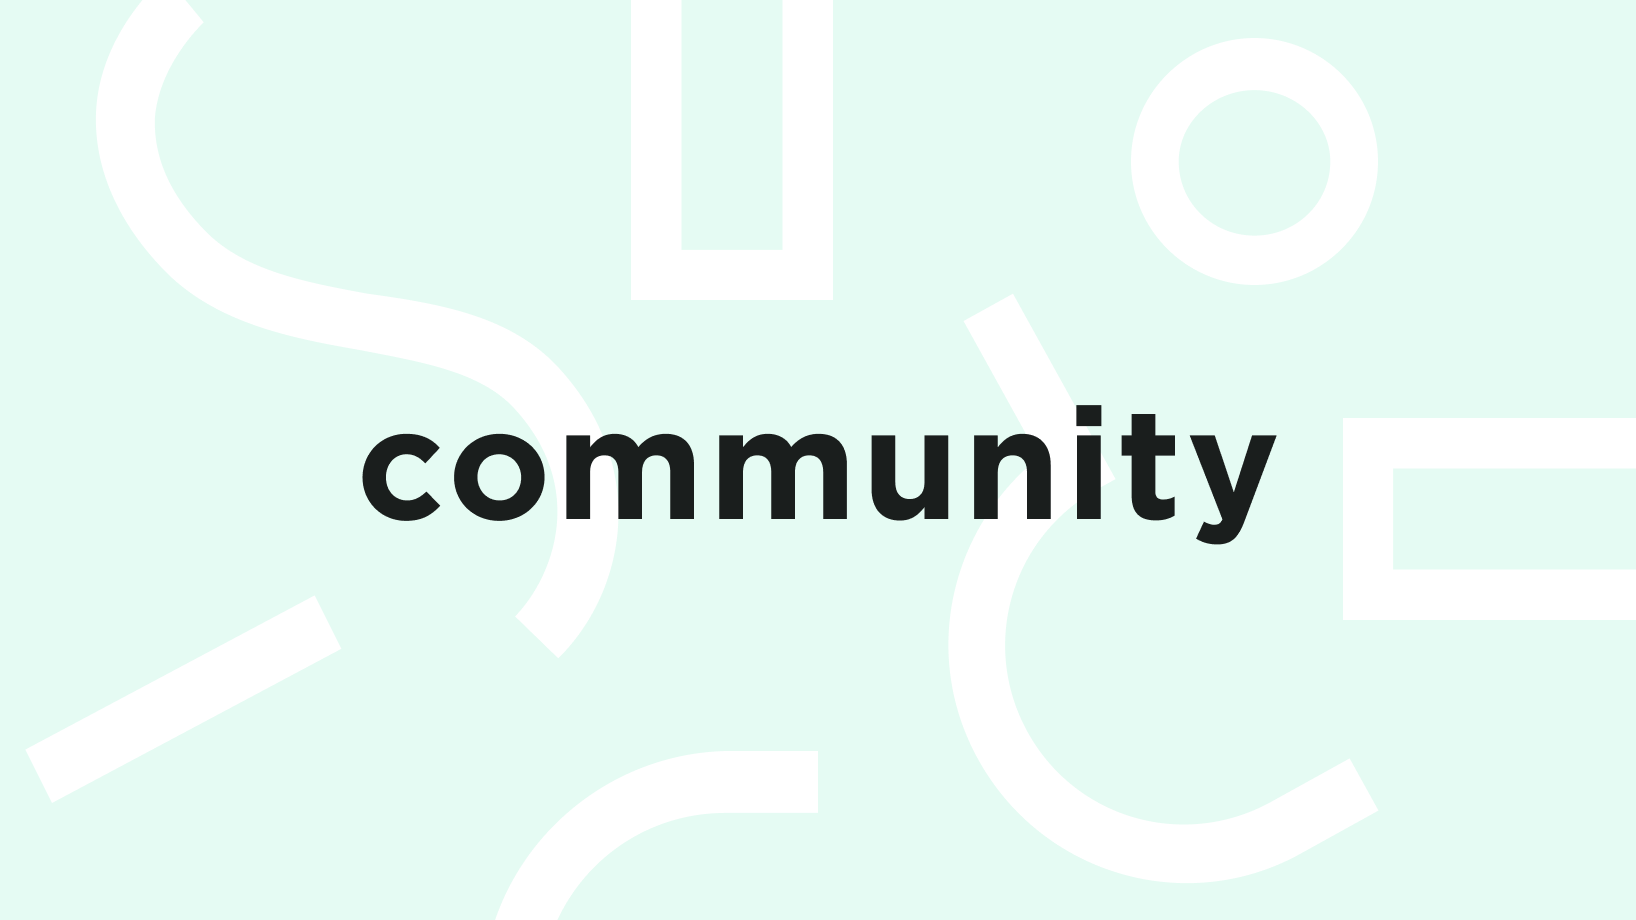 Diprella's community